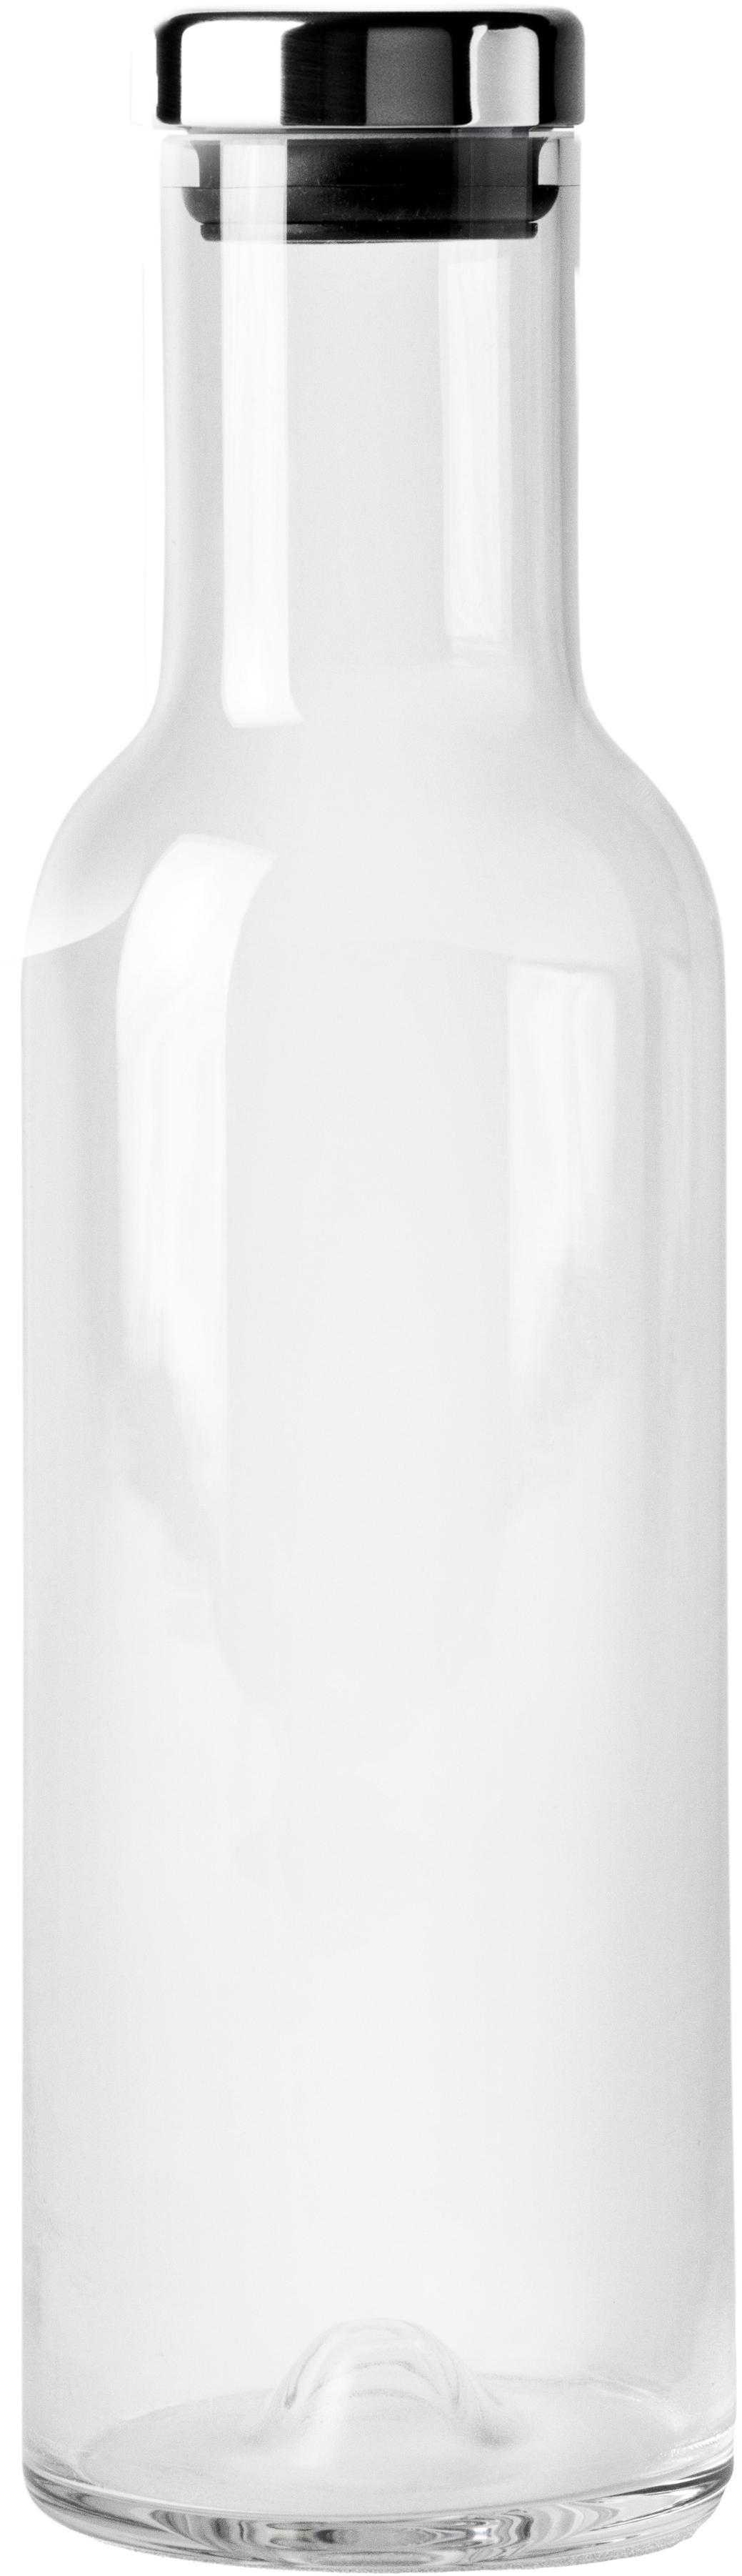 Butelka na wodę Norm, Szkło dmuchane, silikon, Transparentny, 1 l